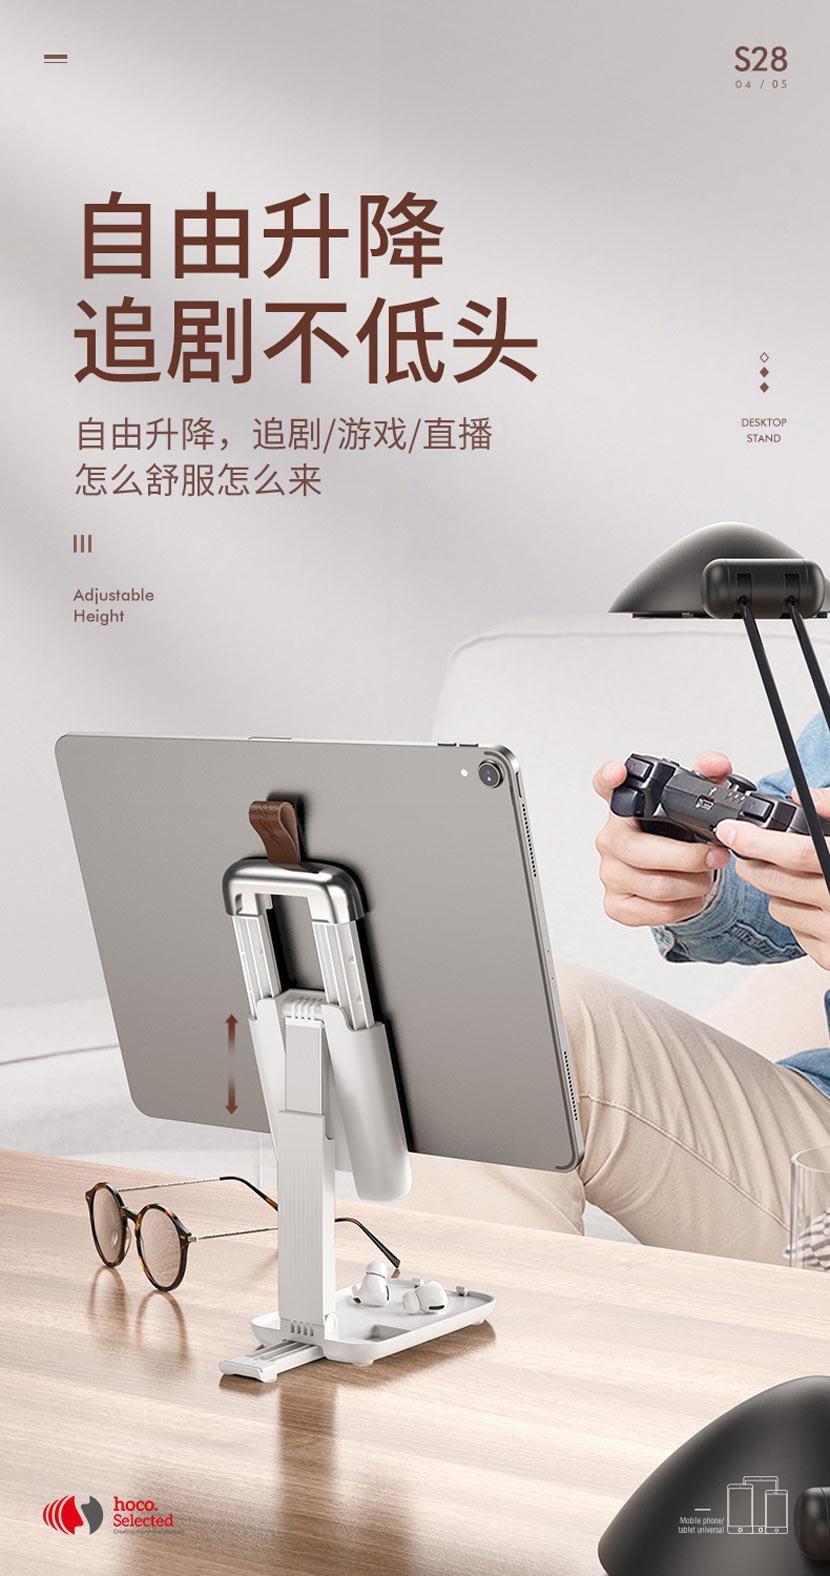 hoco selected news s28 dawn folding desktop stand comfortable cn